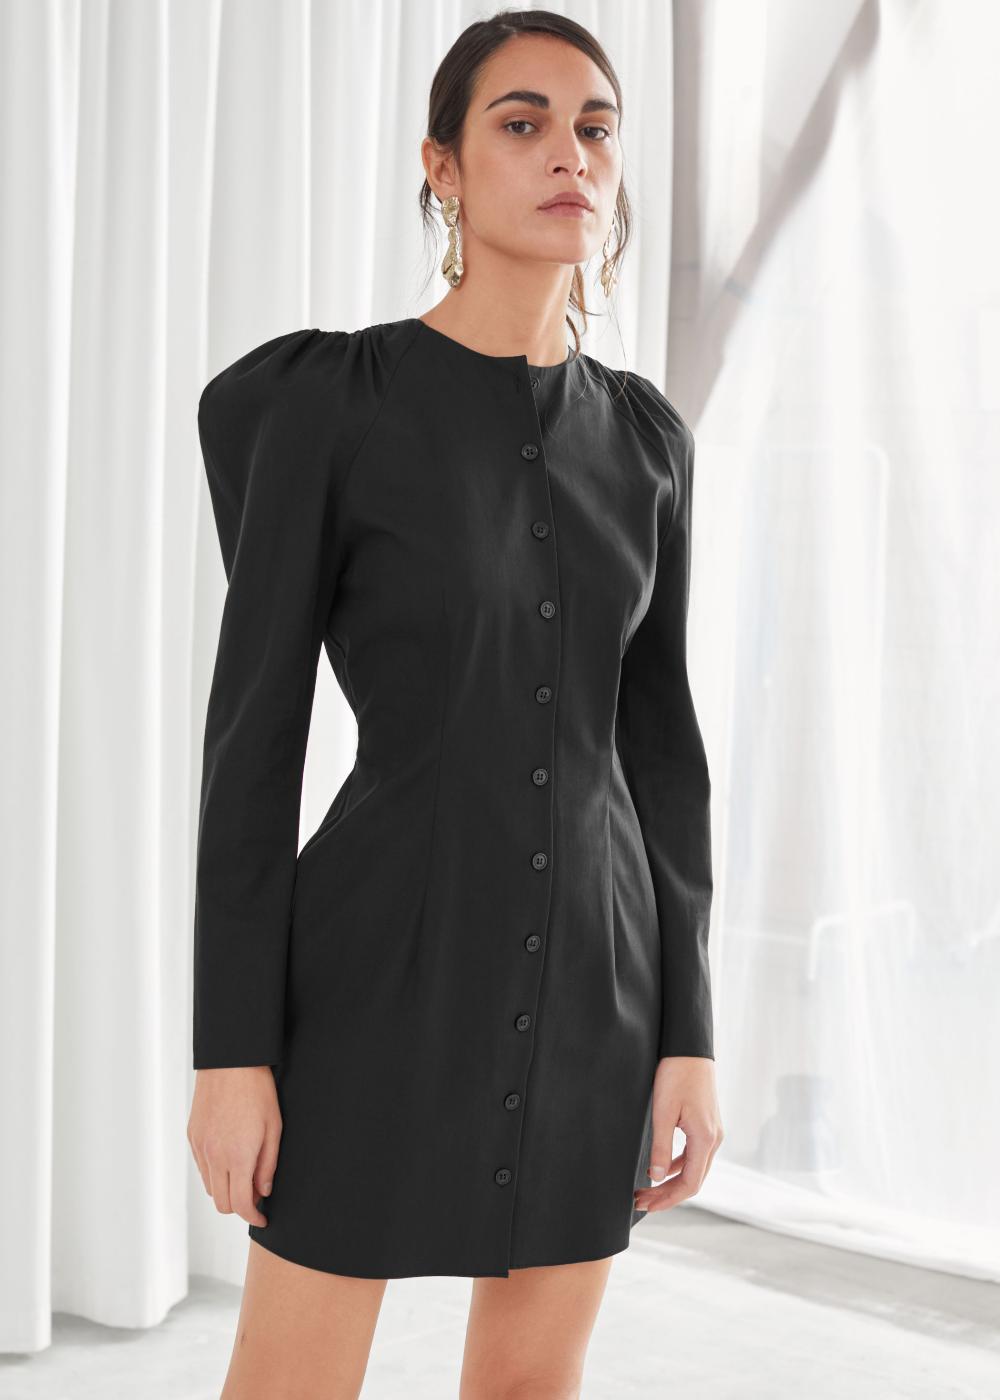 Pdp Mini Dress Fashion Mini Black Dress [ 1400 x 1000 Pixel ]